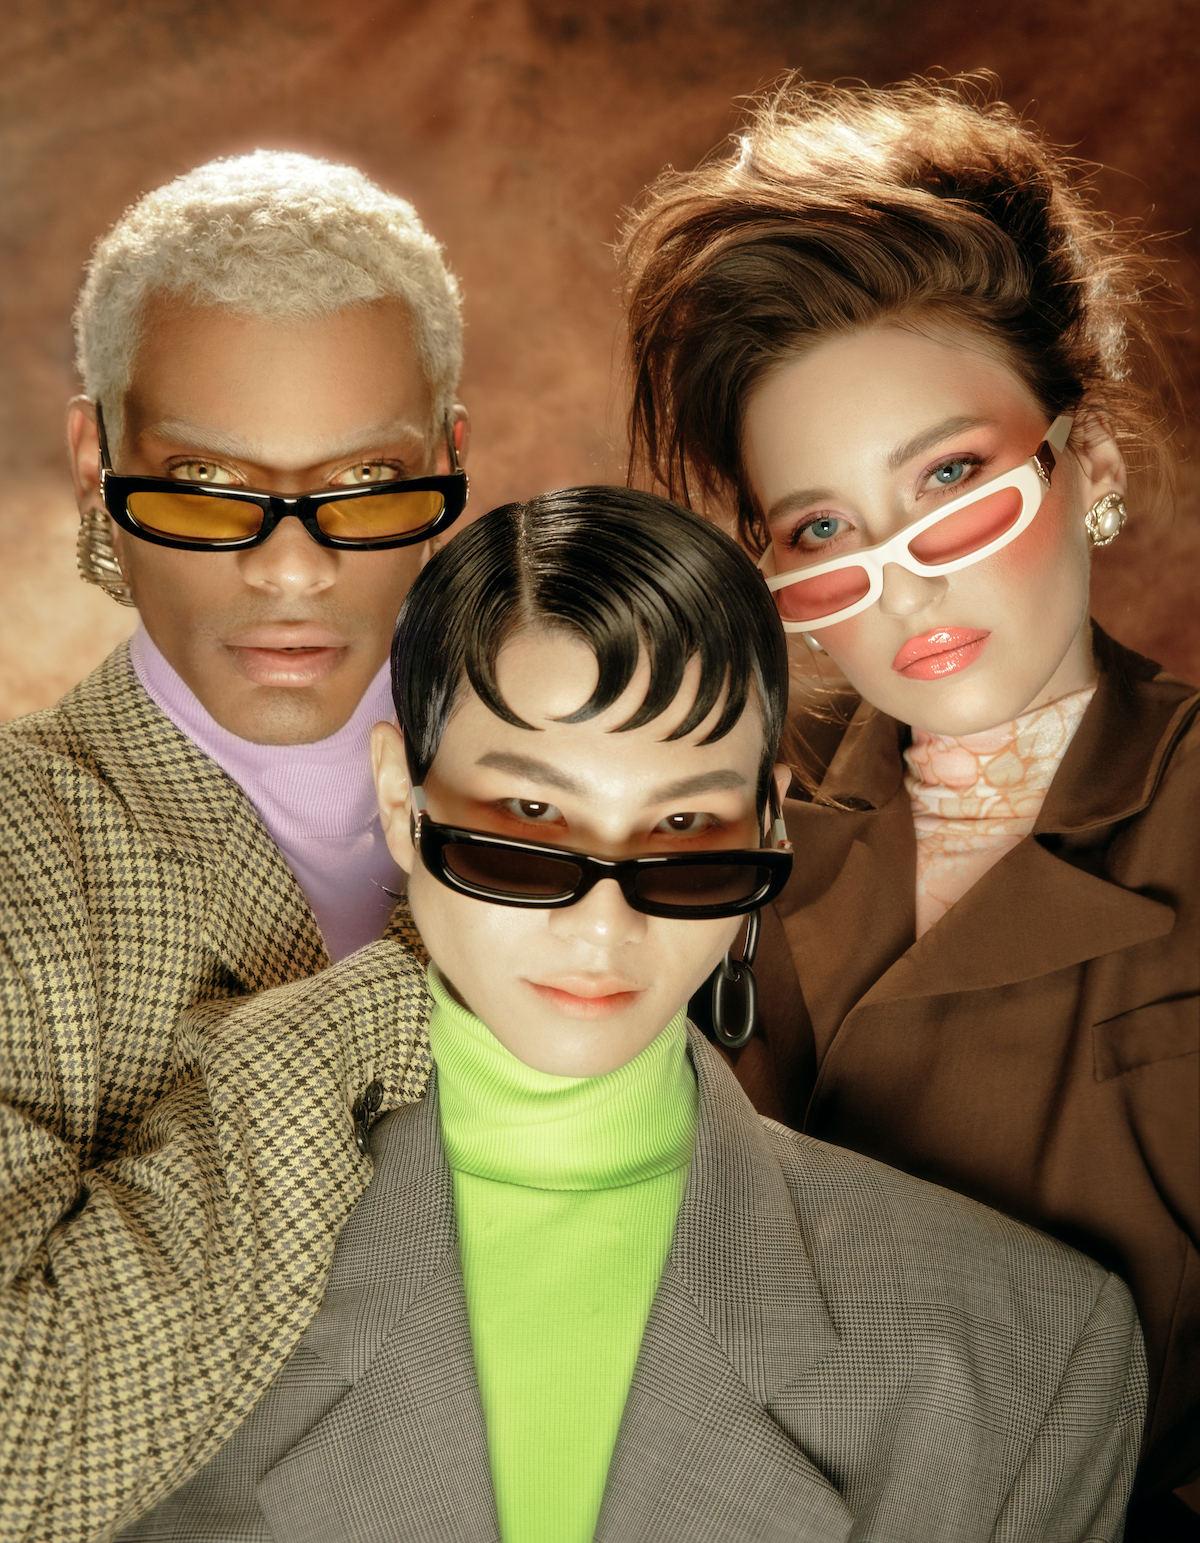 FAKBYFAK x Pilar Zeta  SHARP. Sunglasses. Glossy Ivory & Pink Code: FBF-14-01-03